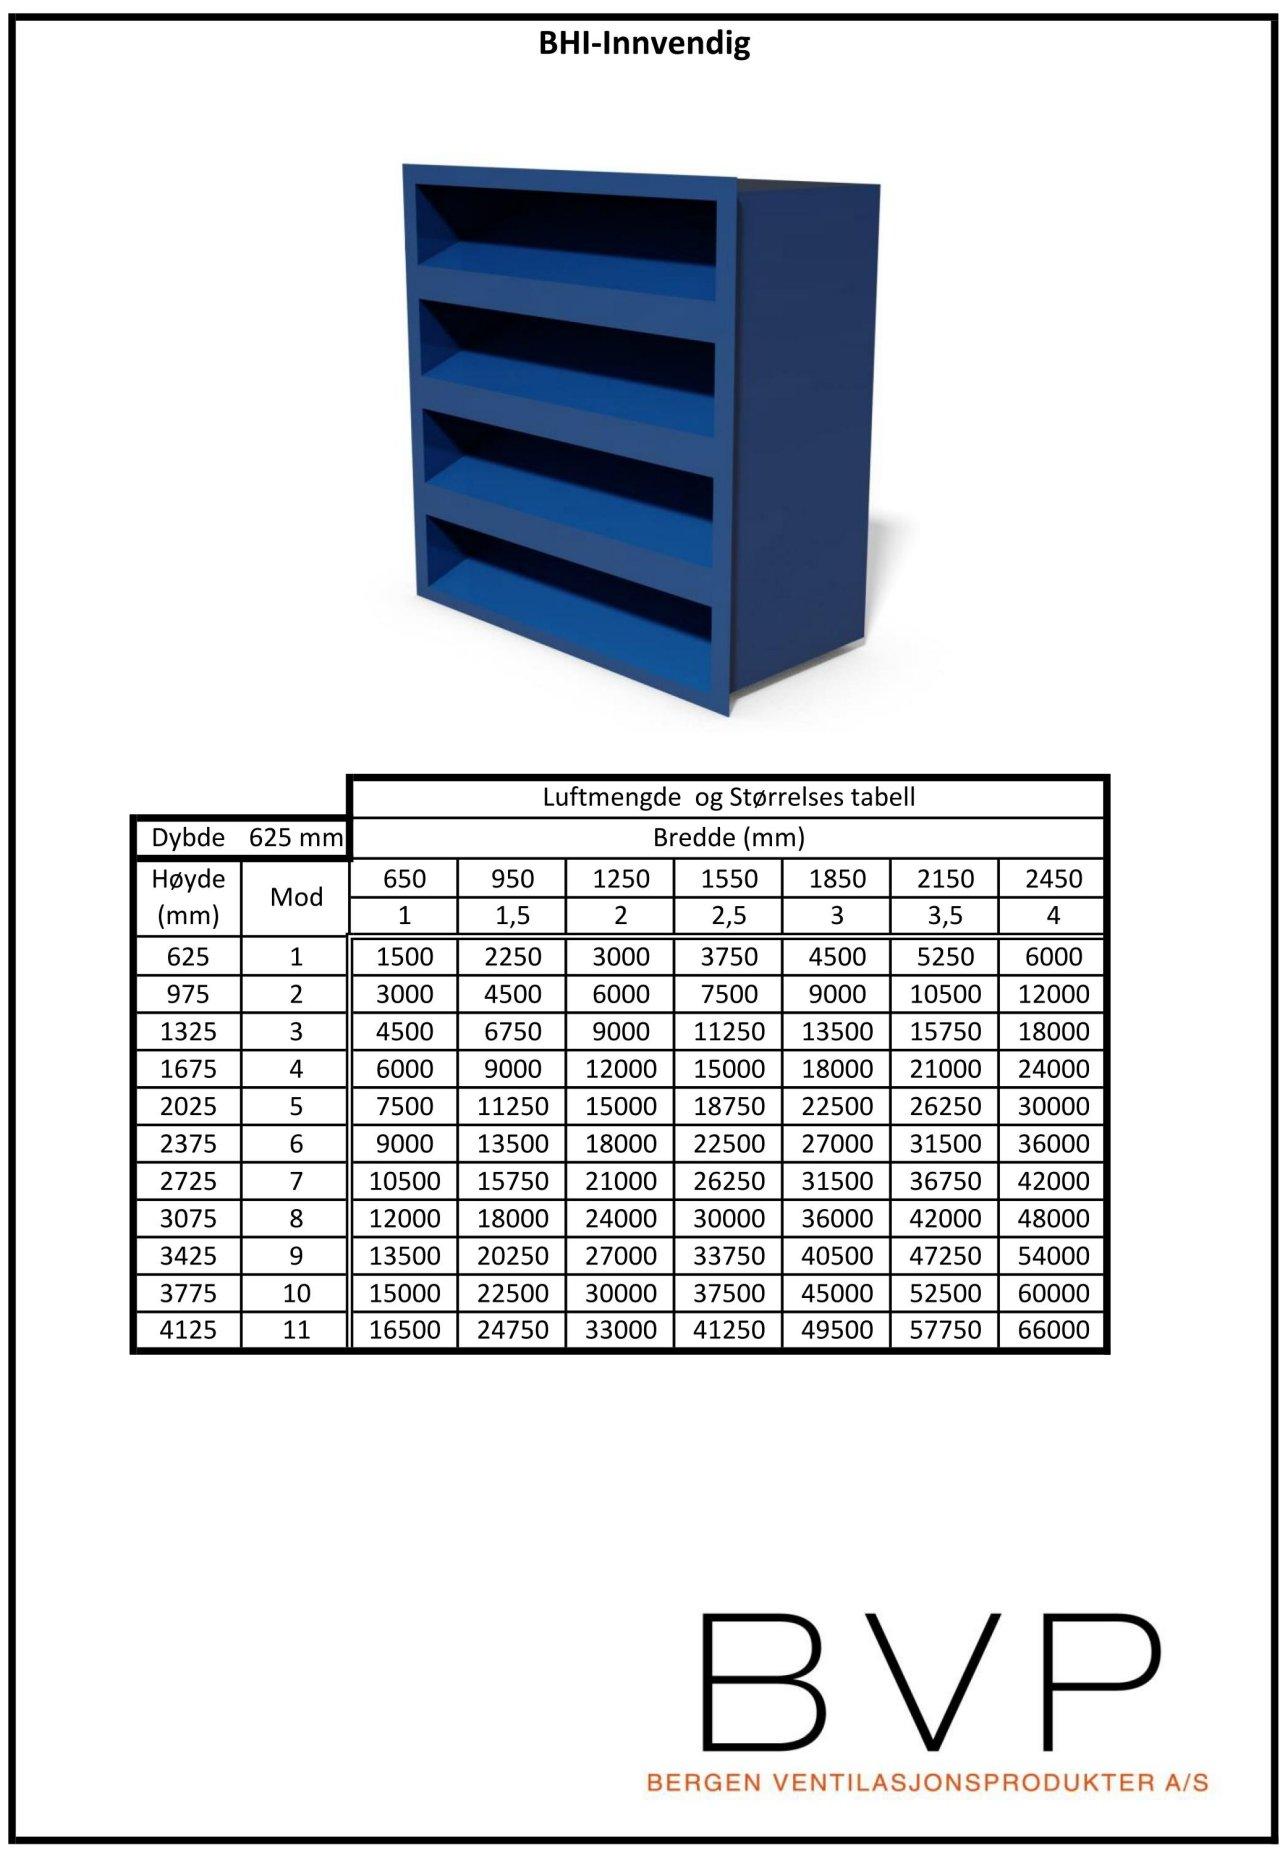 bhi-innvendig-bergensrist-tekniske-data-1280